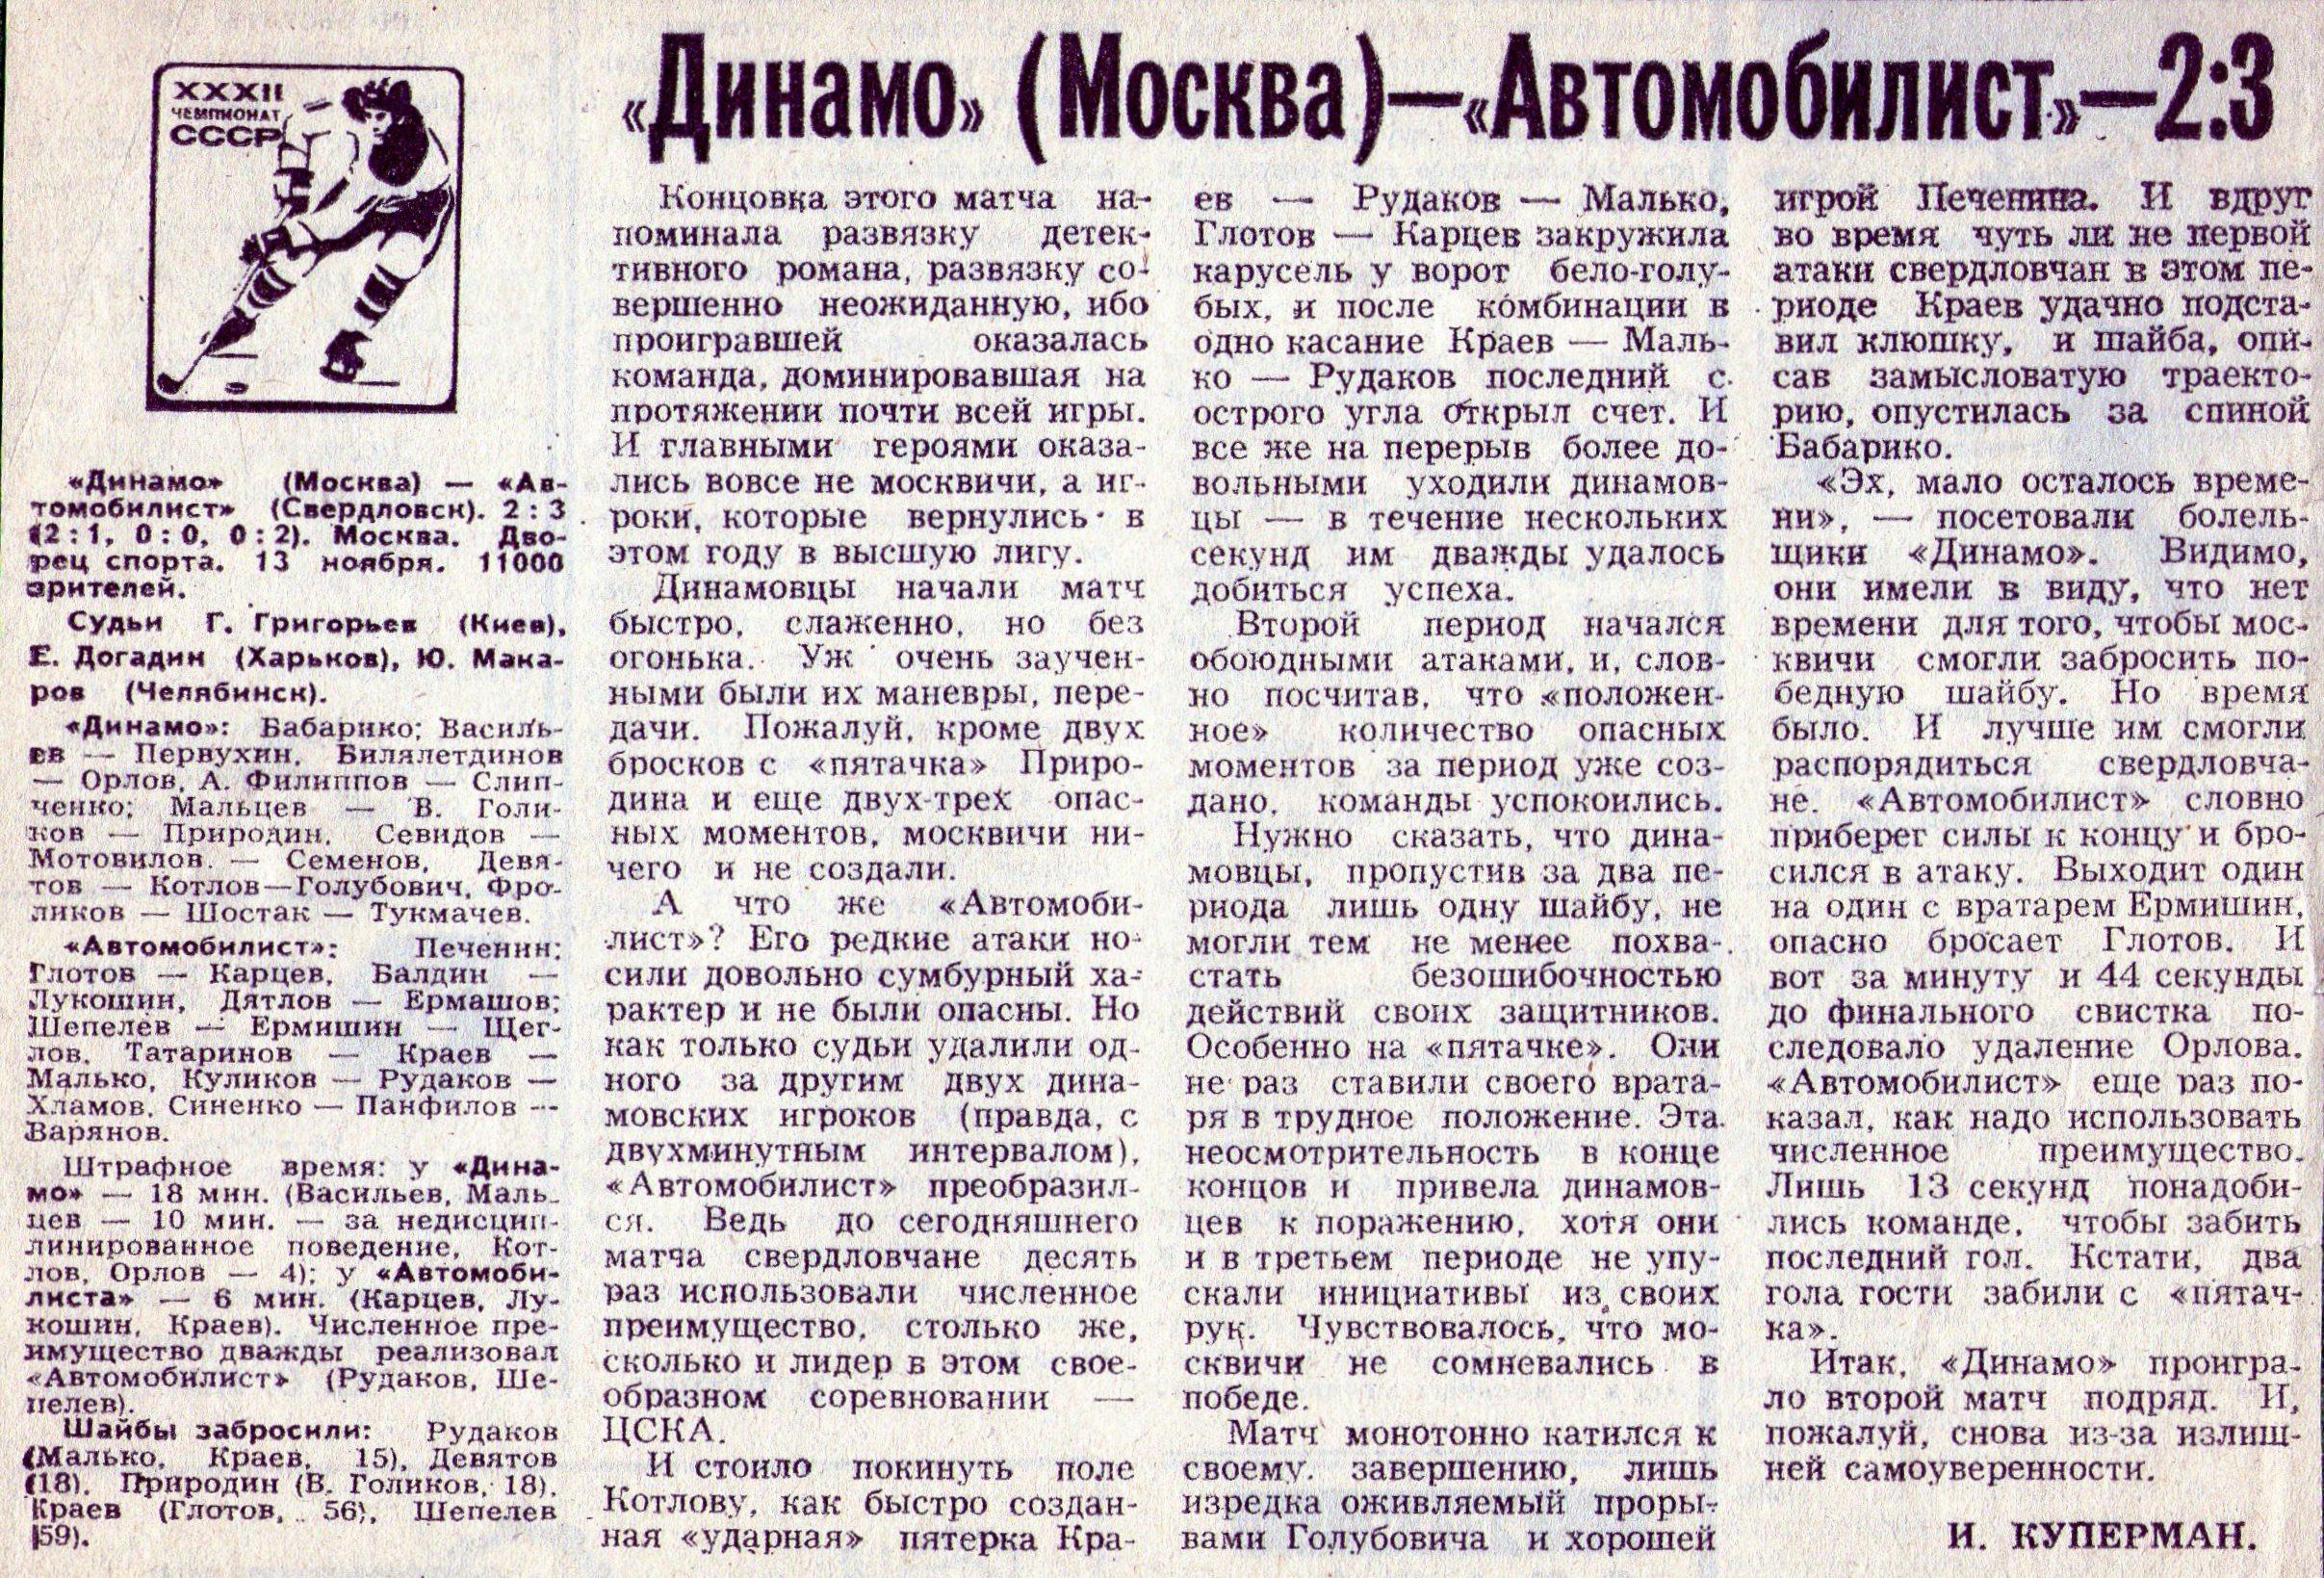 1977.11.13 Динамо М 2-3 Автомобилист Св..jpg